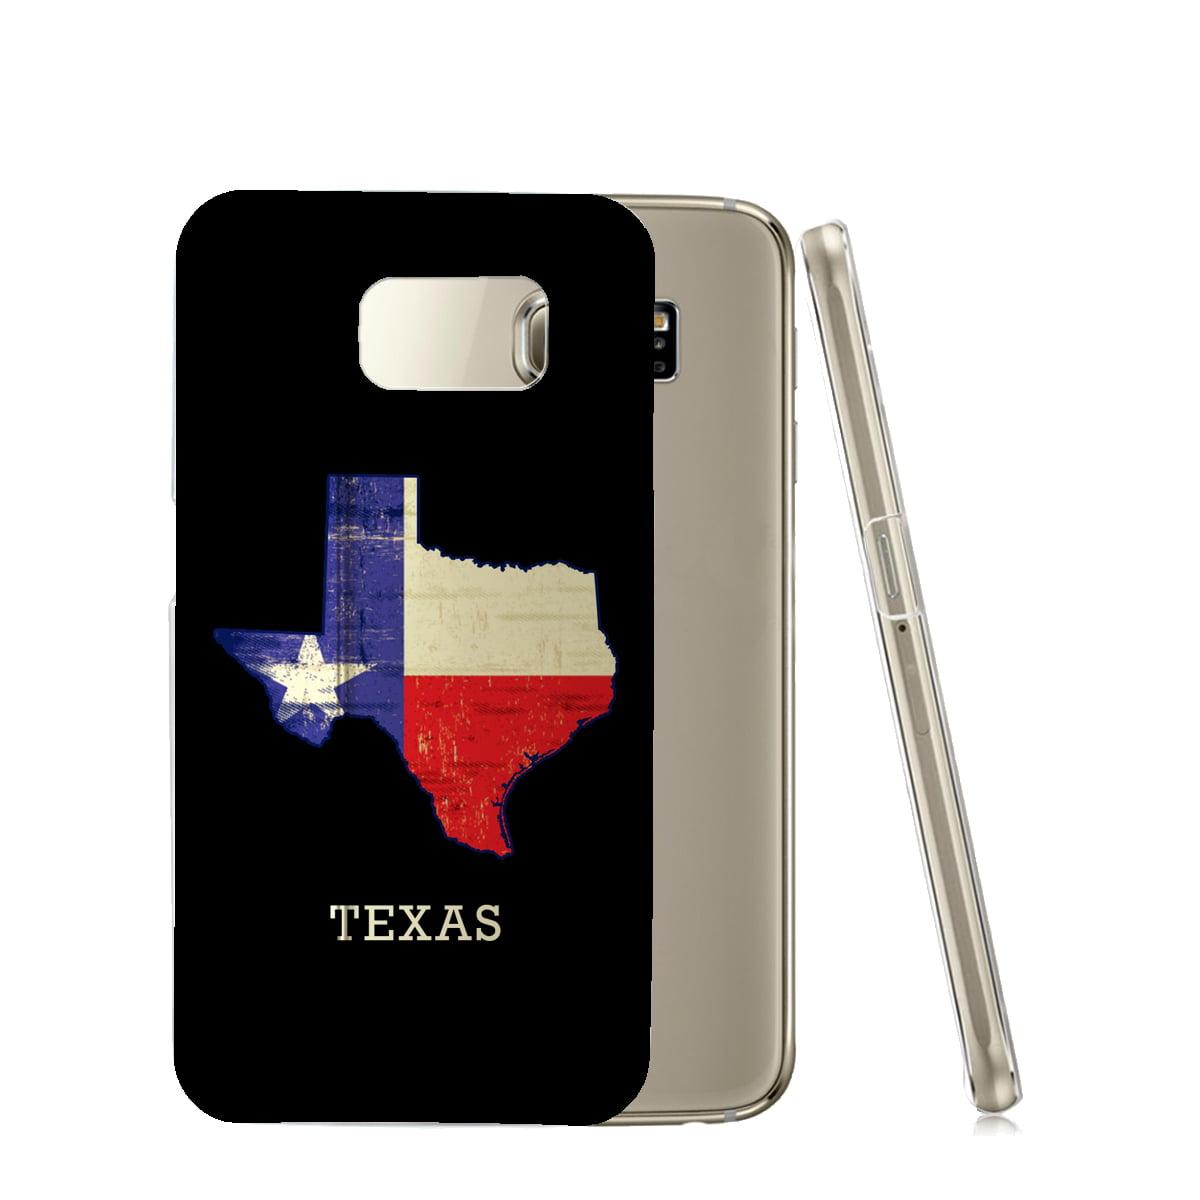 KuzmarK™ Samsung Galaxy S6 Edge Clear Cover Case - State of Texas Flag